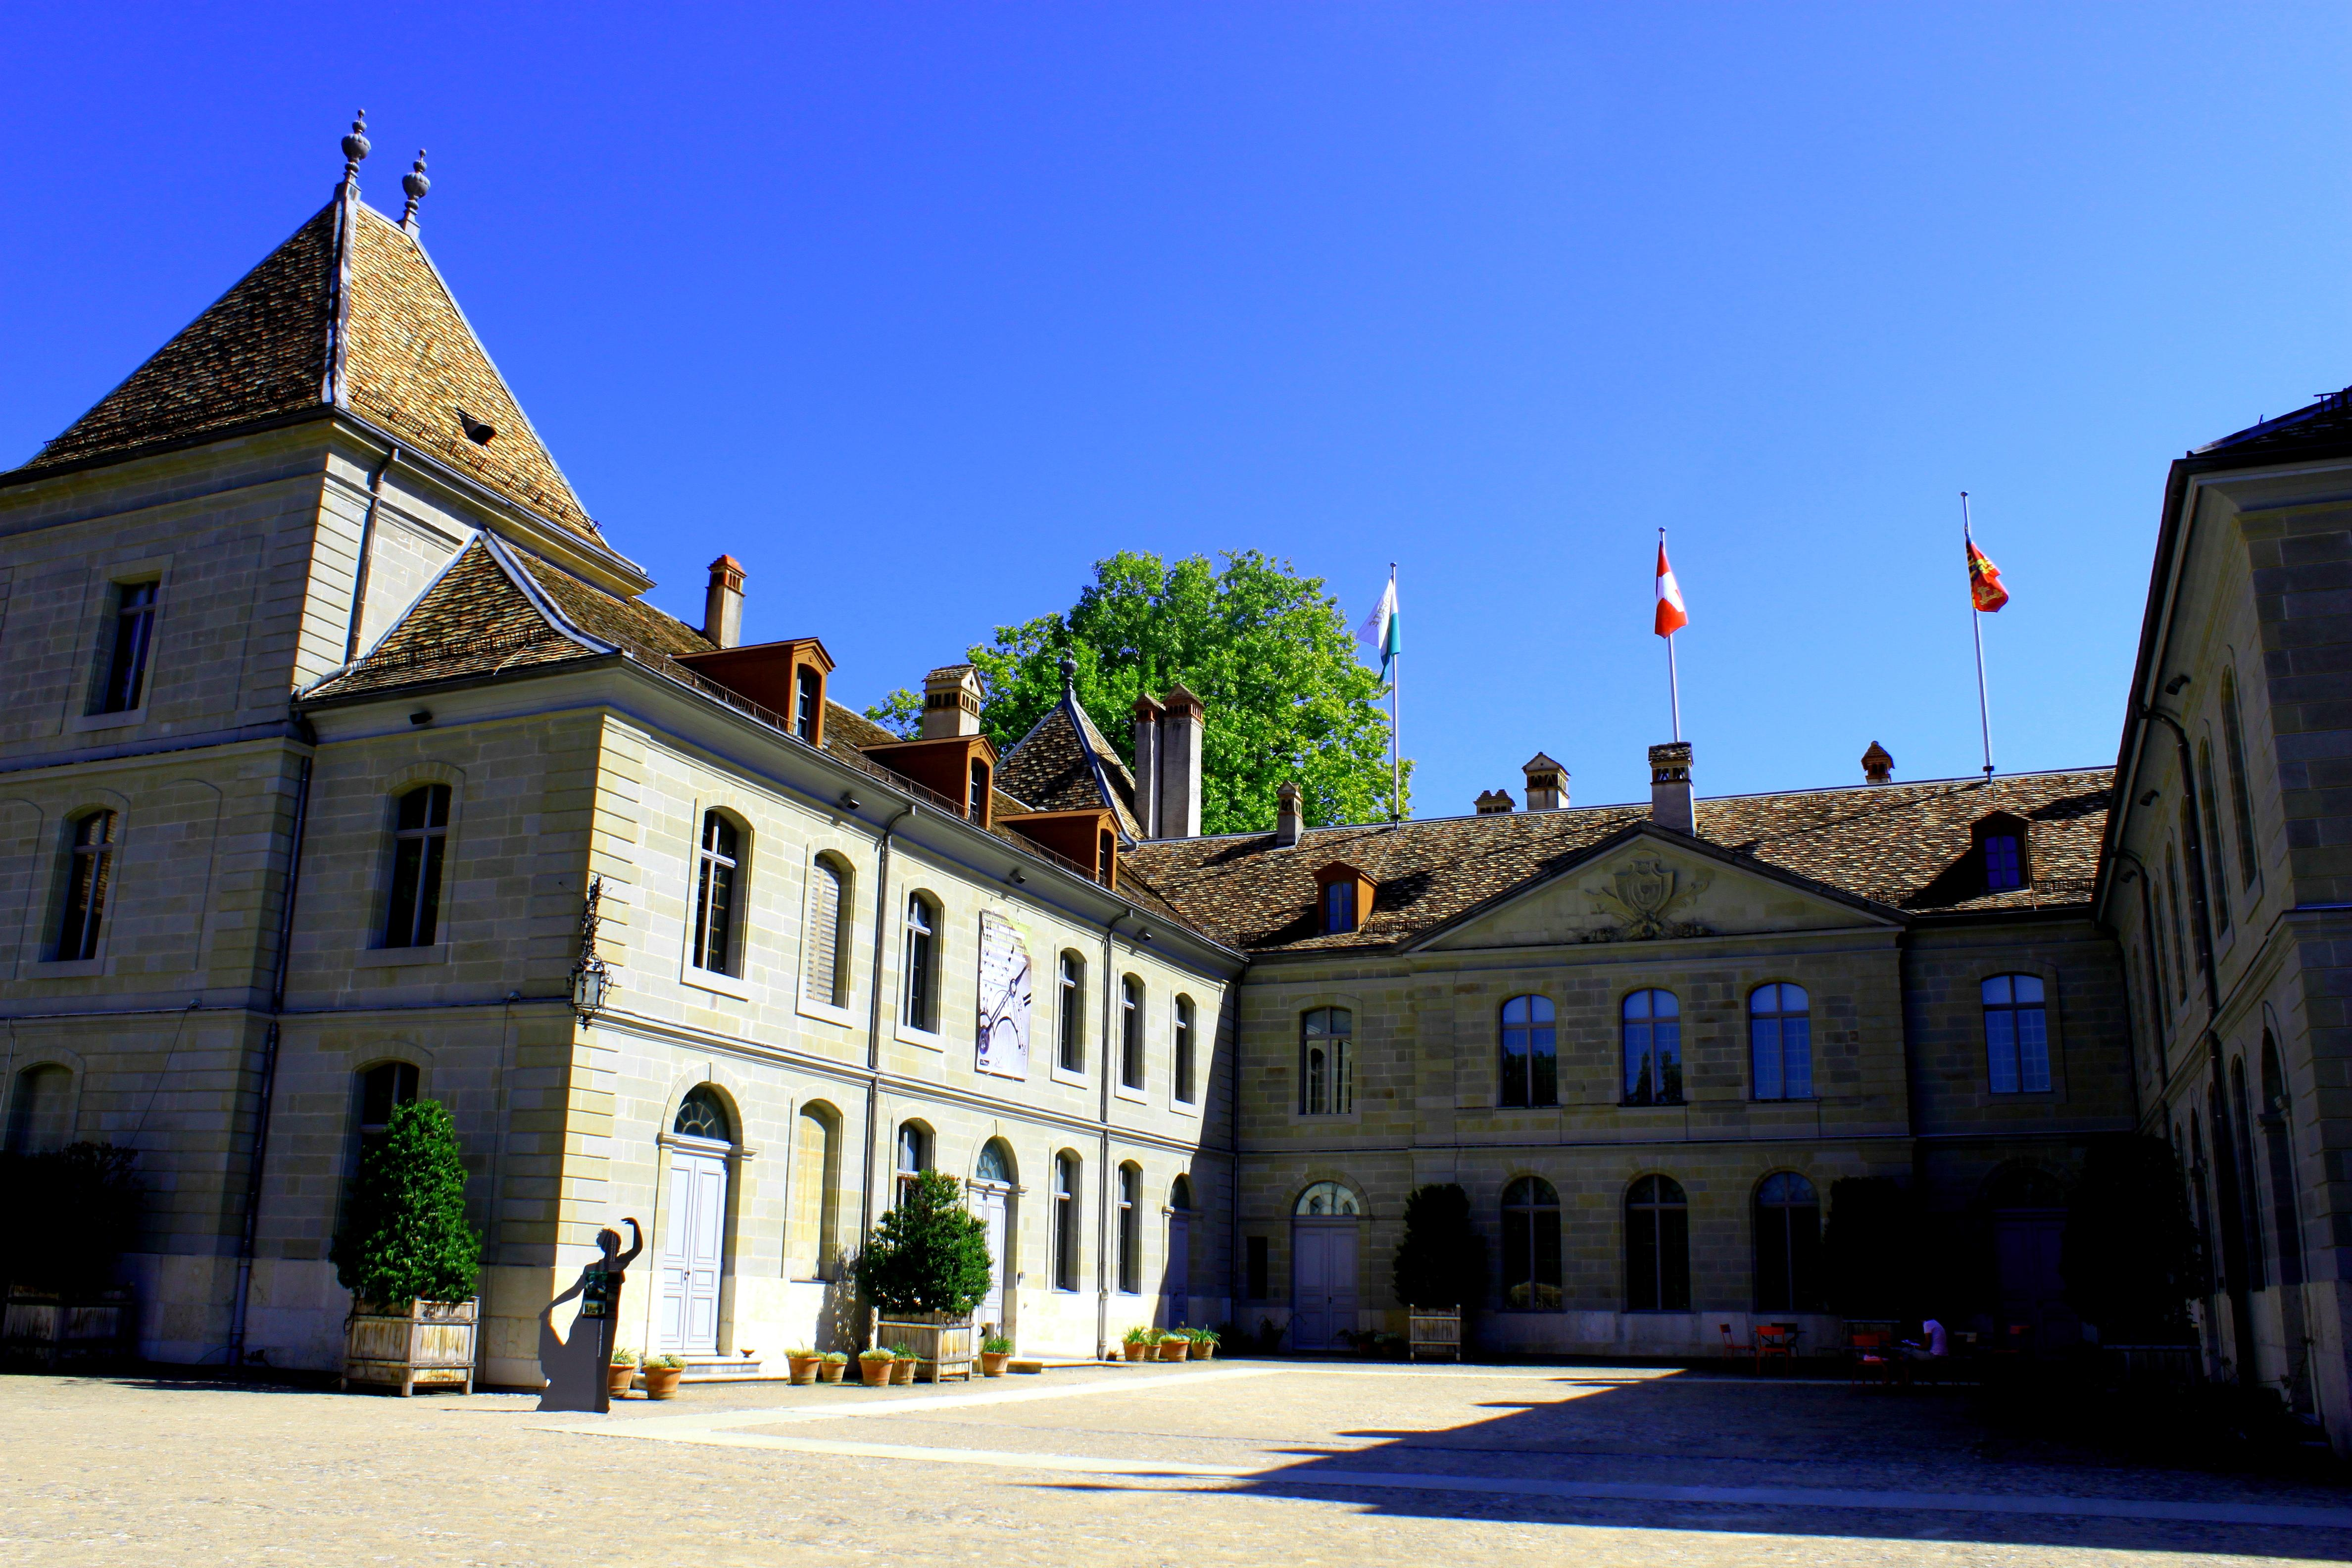 File:Château de Prangins 6.jpg - Wikimedia Commons